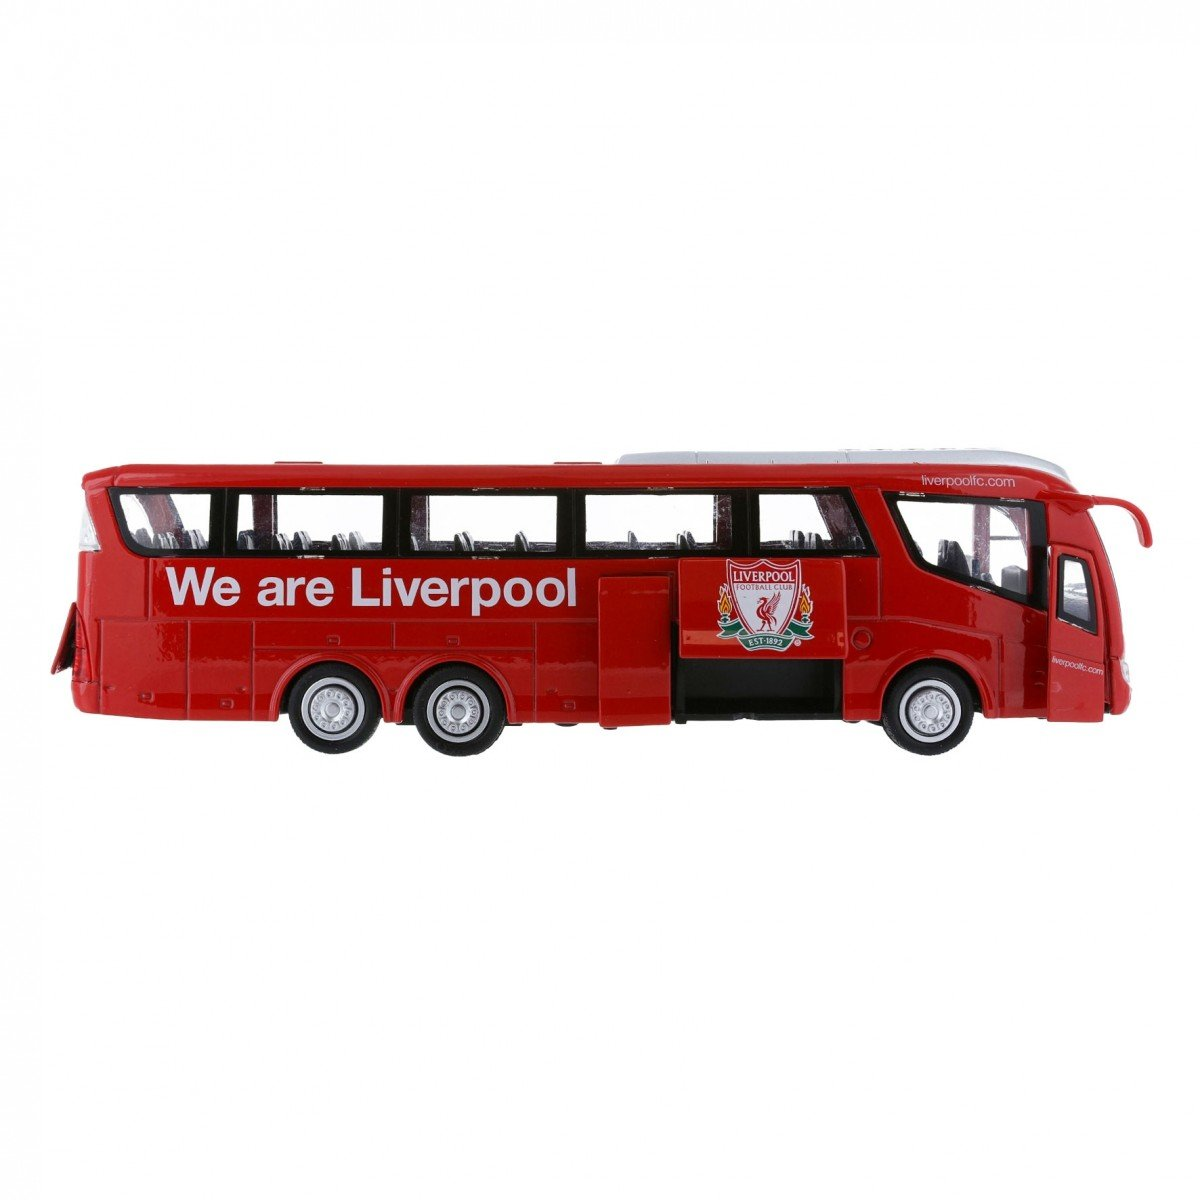 Liverpool FC Team Bus Modell - Fanartikel - Fanshop